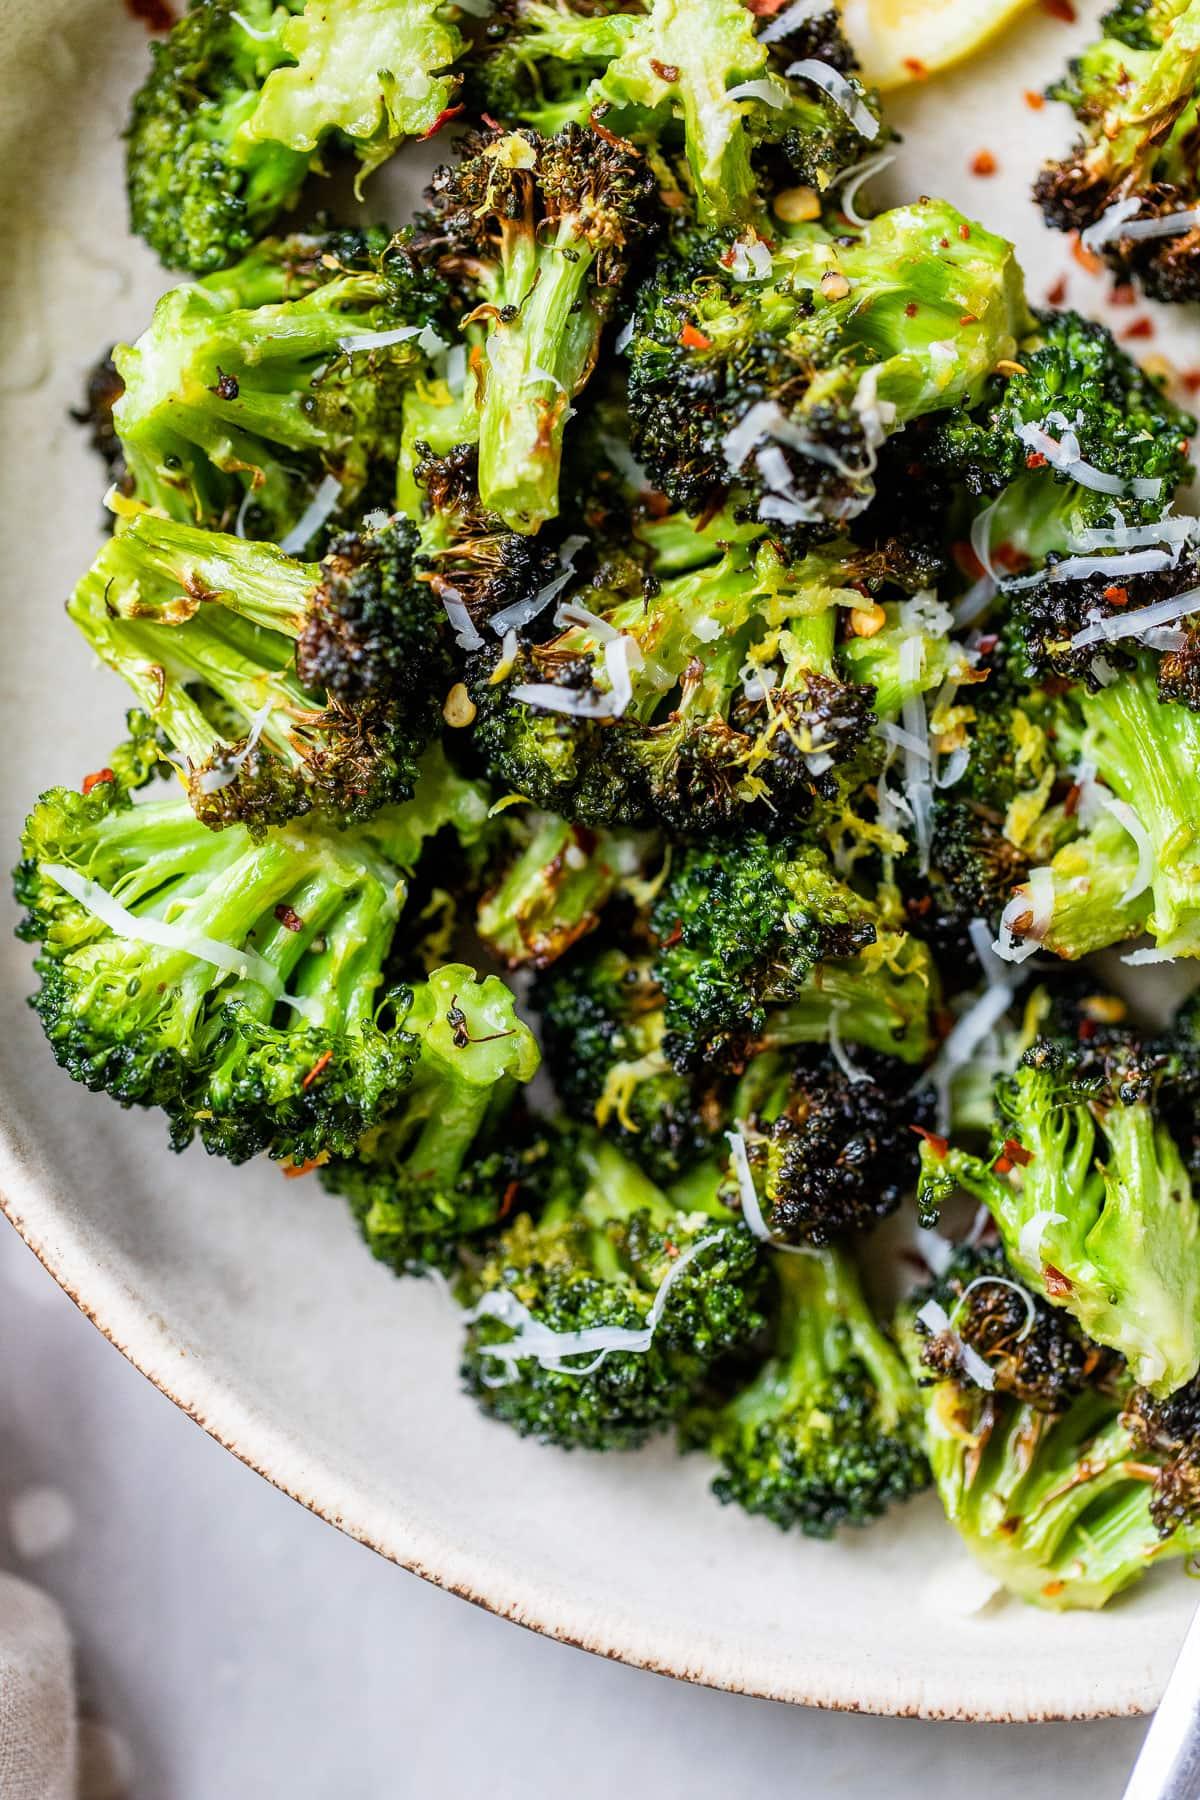 Crispy air fryer broccoli